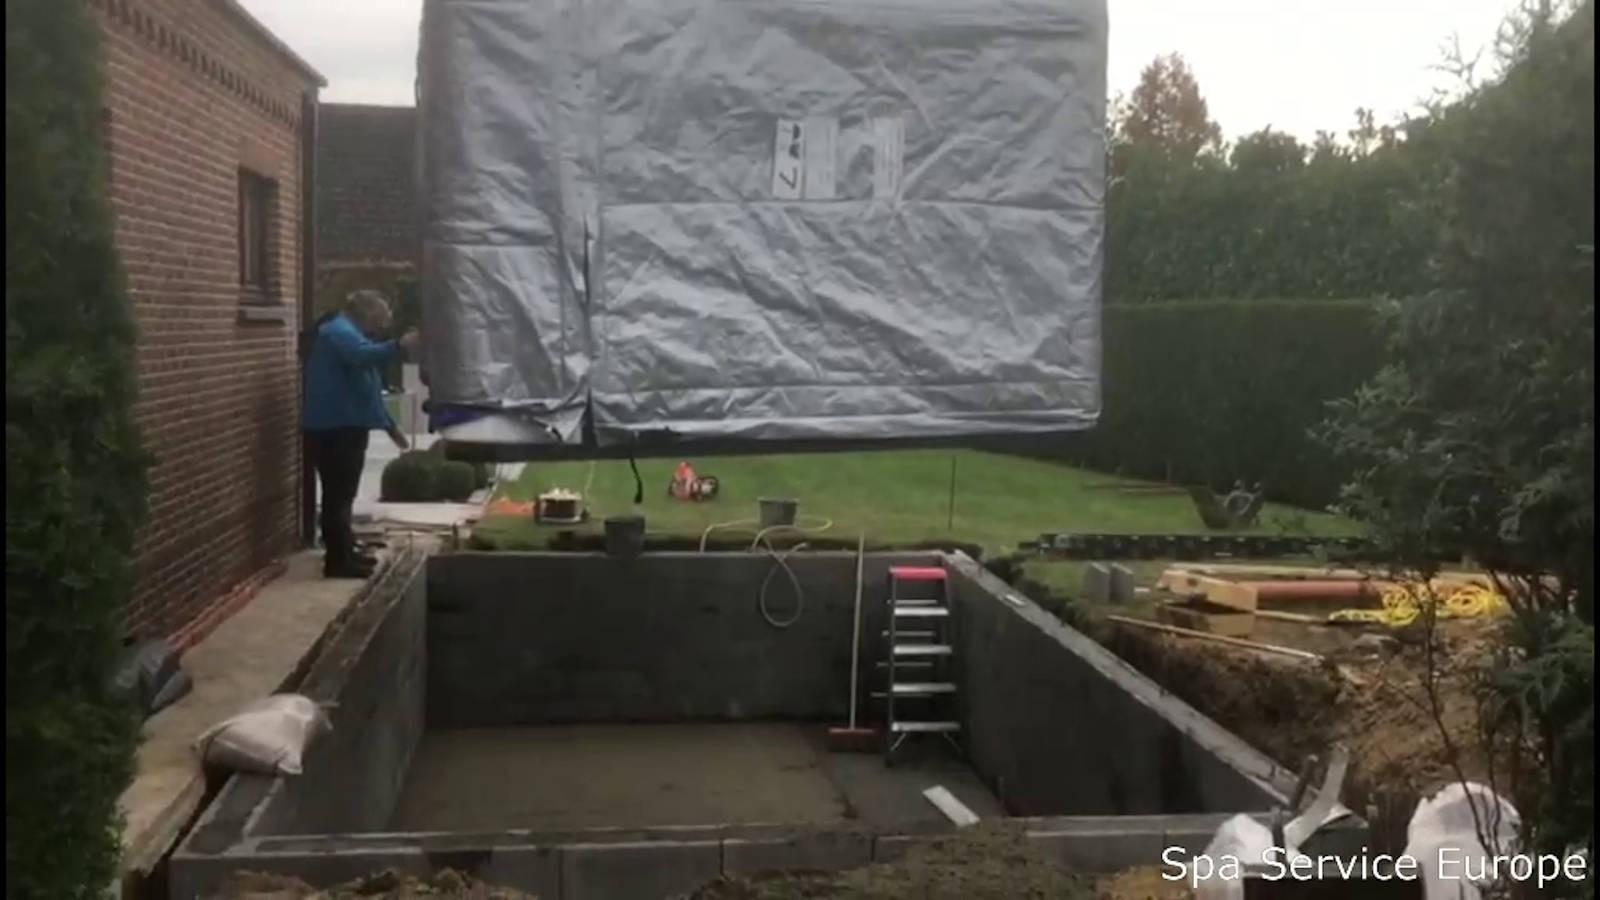 Plaatsing Allseas Exercise pool (swimspa) in Lochristi België